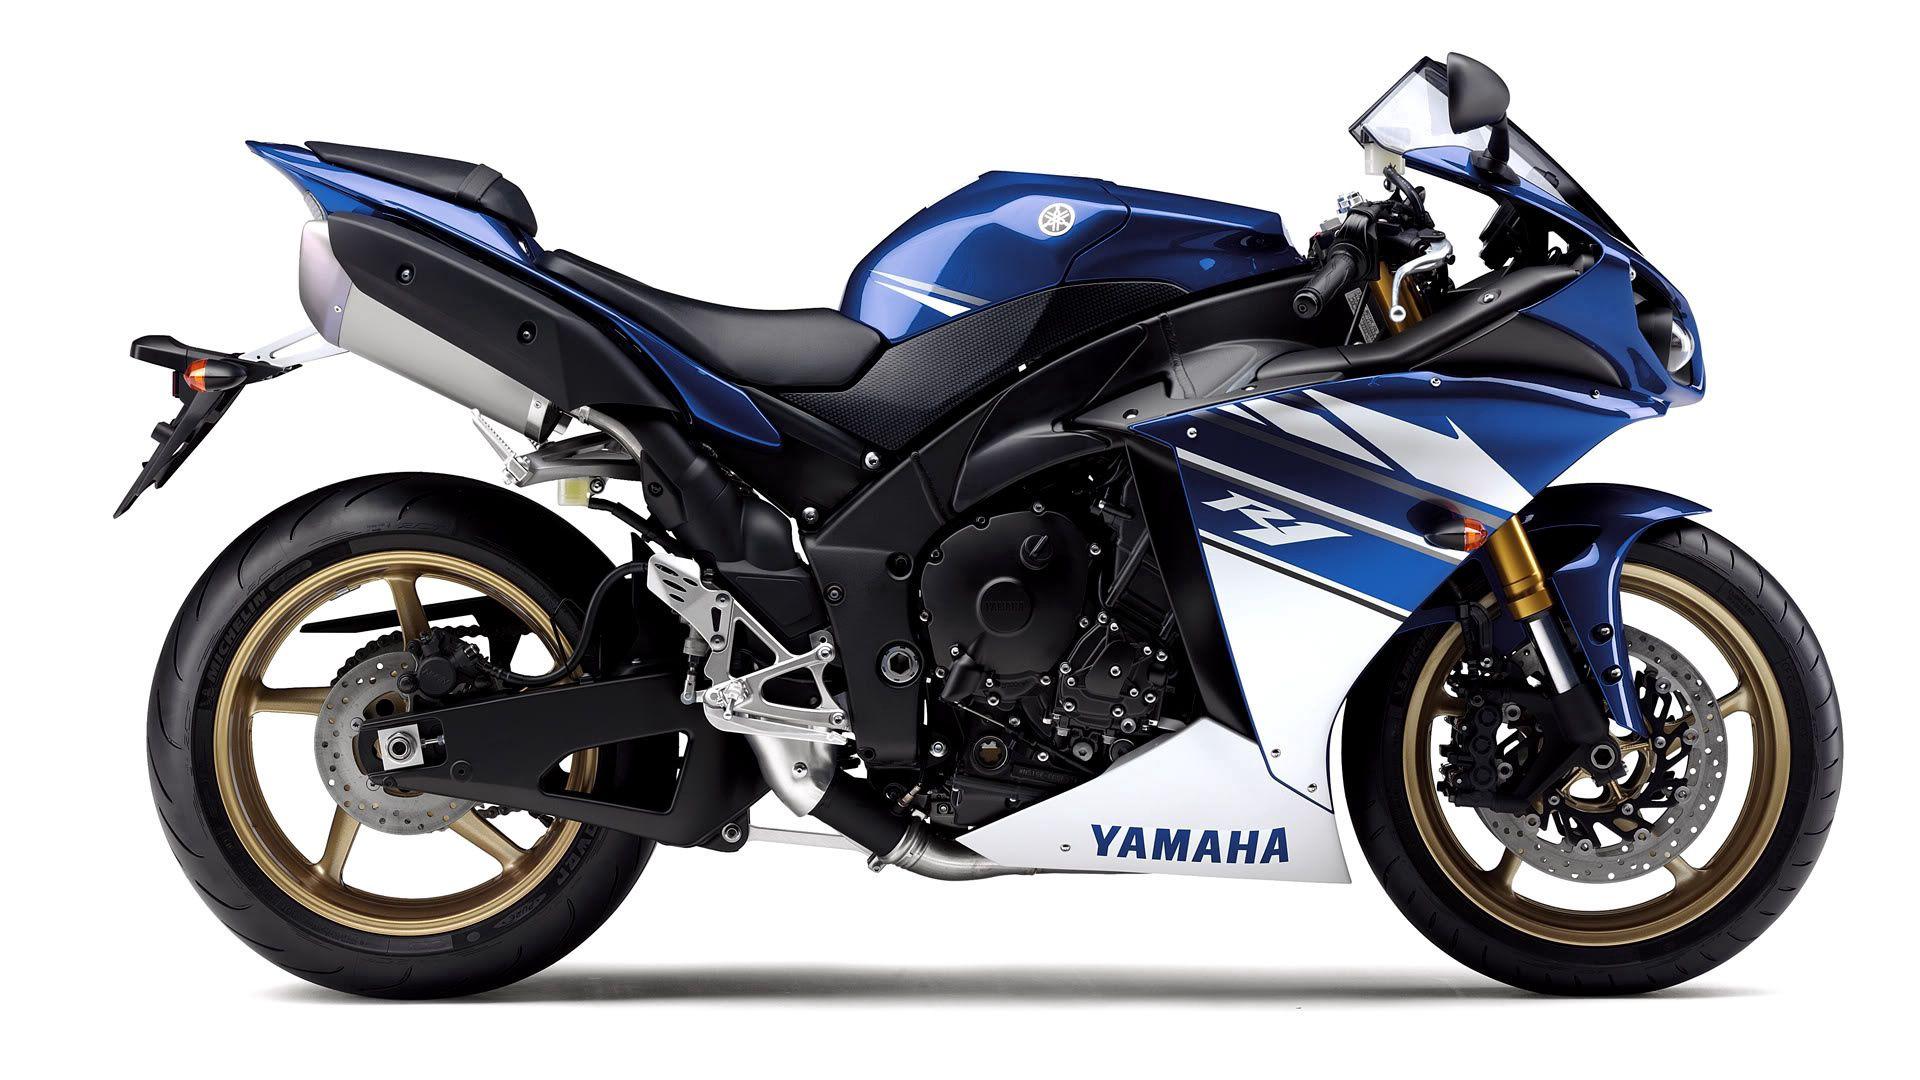 Yamaha, Motorbike Blue, Yamaha R1 Wallpapers Free Download